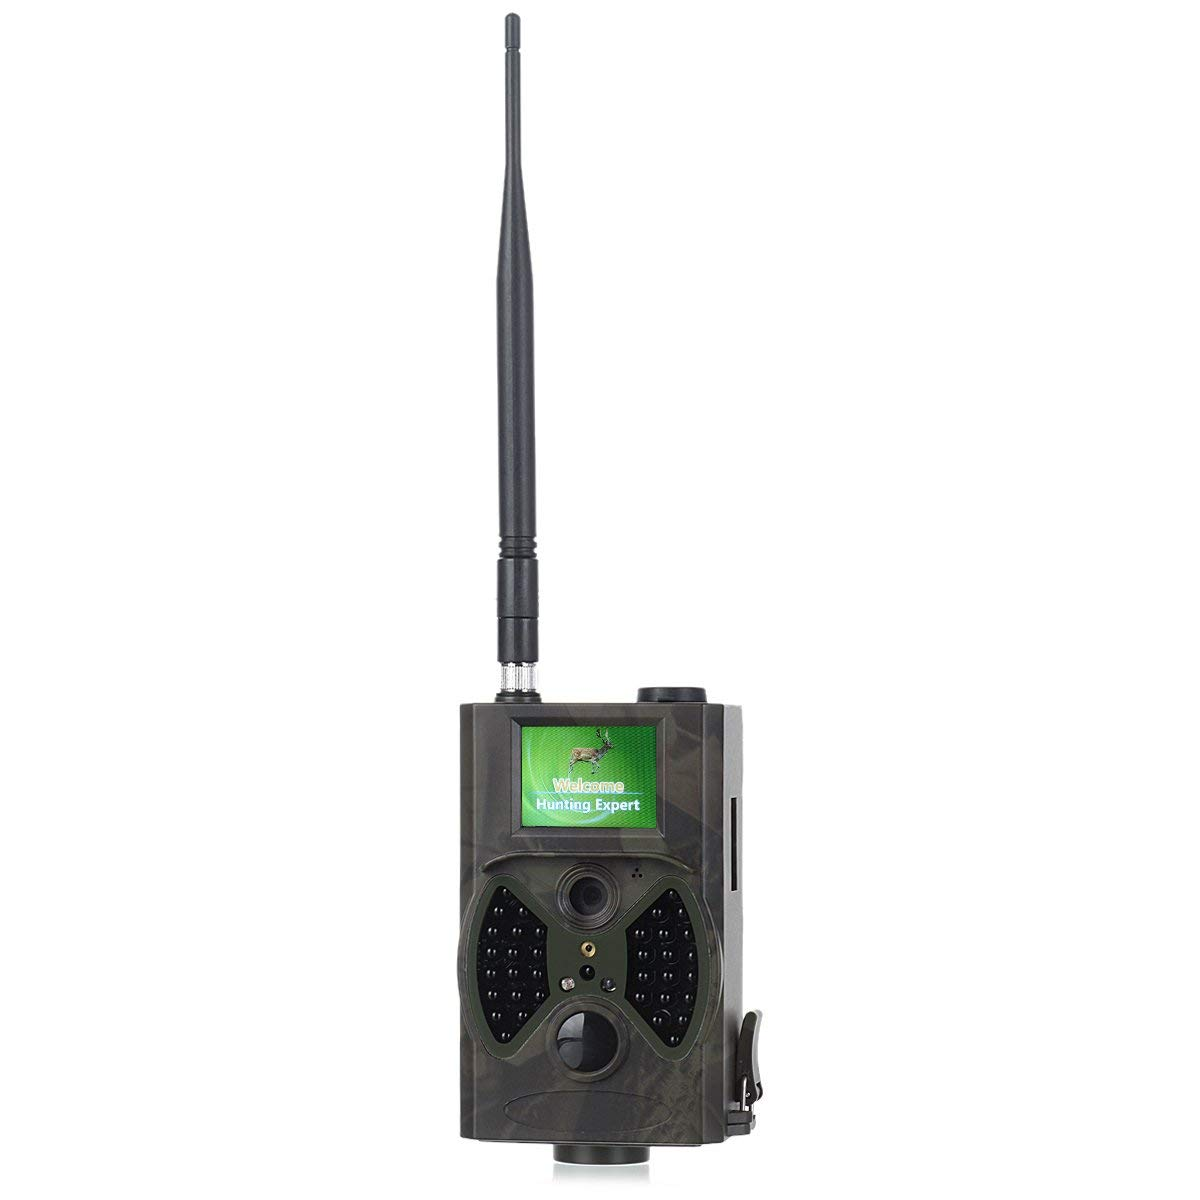 OLSUS Security Camera - Camouflage Waterproof Night Vision Camera Hunting Trail Camera